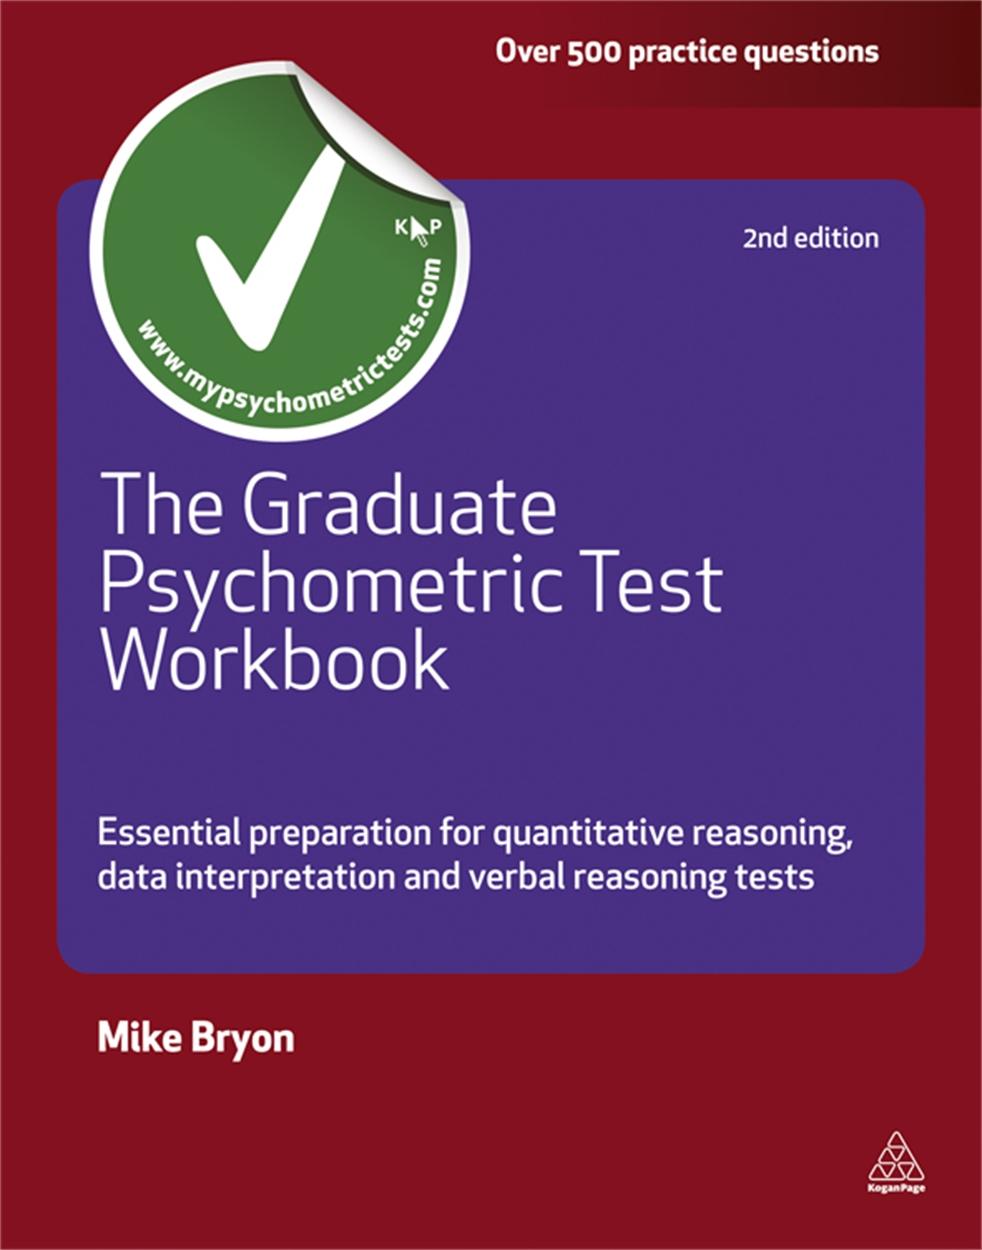 The Graduate Psychometric Test Workbook (9780749461744)